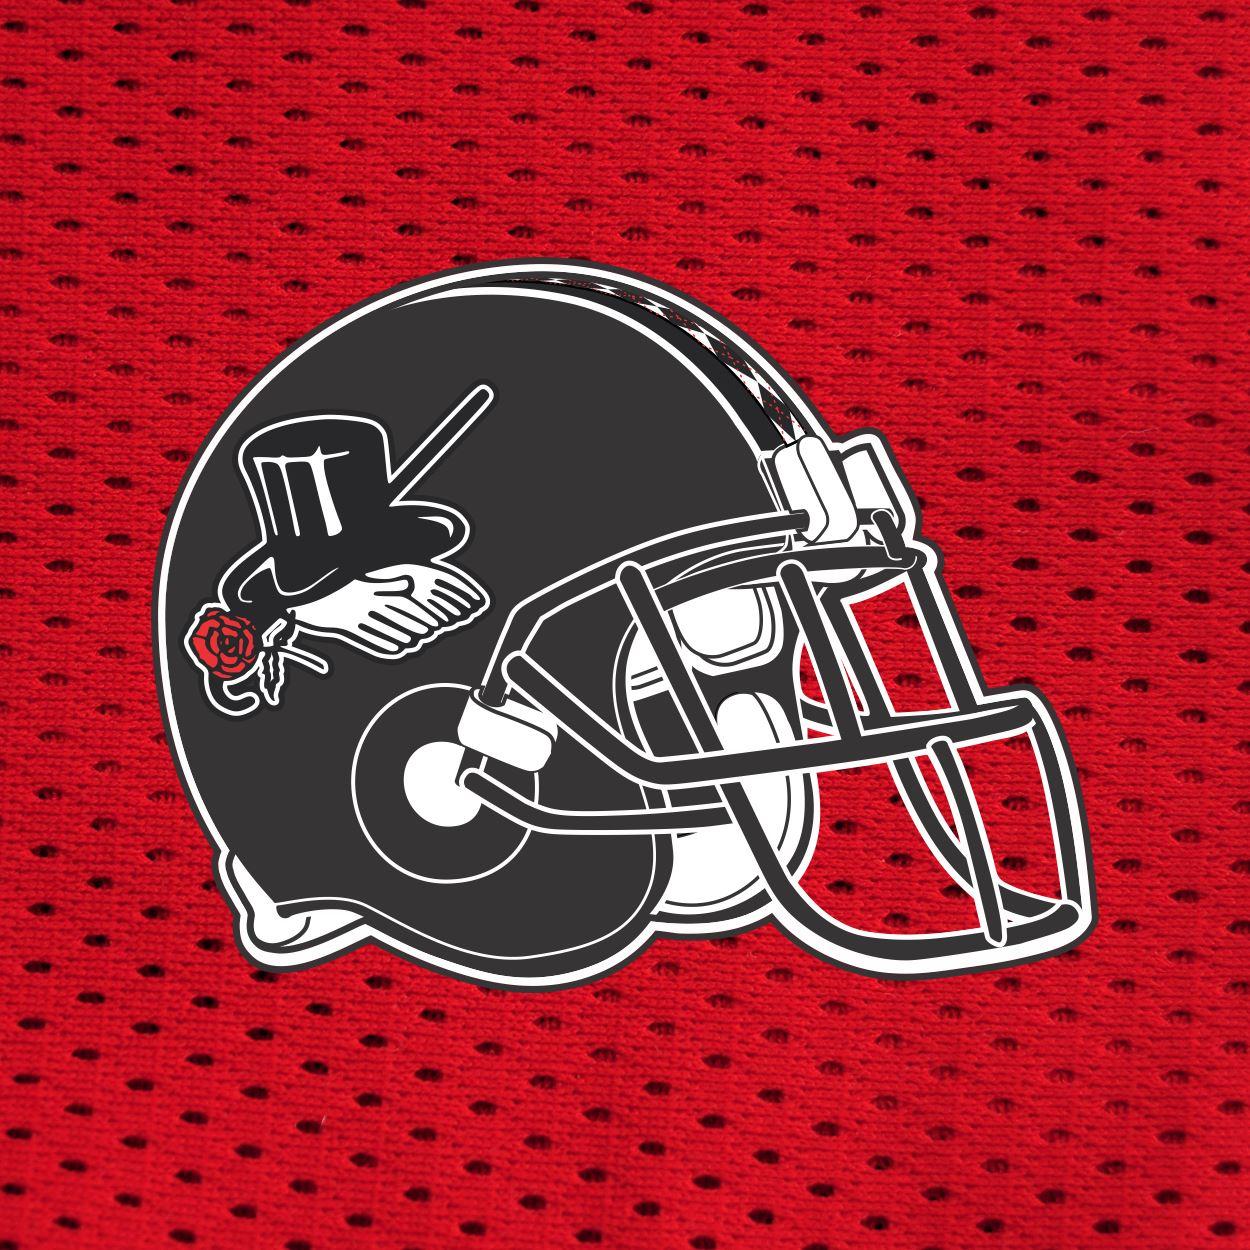 Williamsport High School - Boys Varsity Football